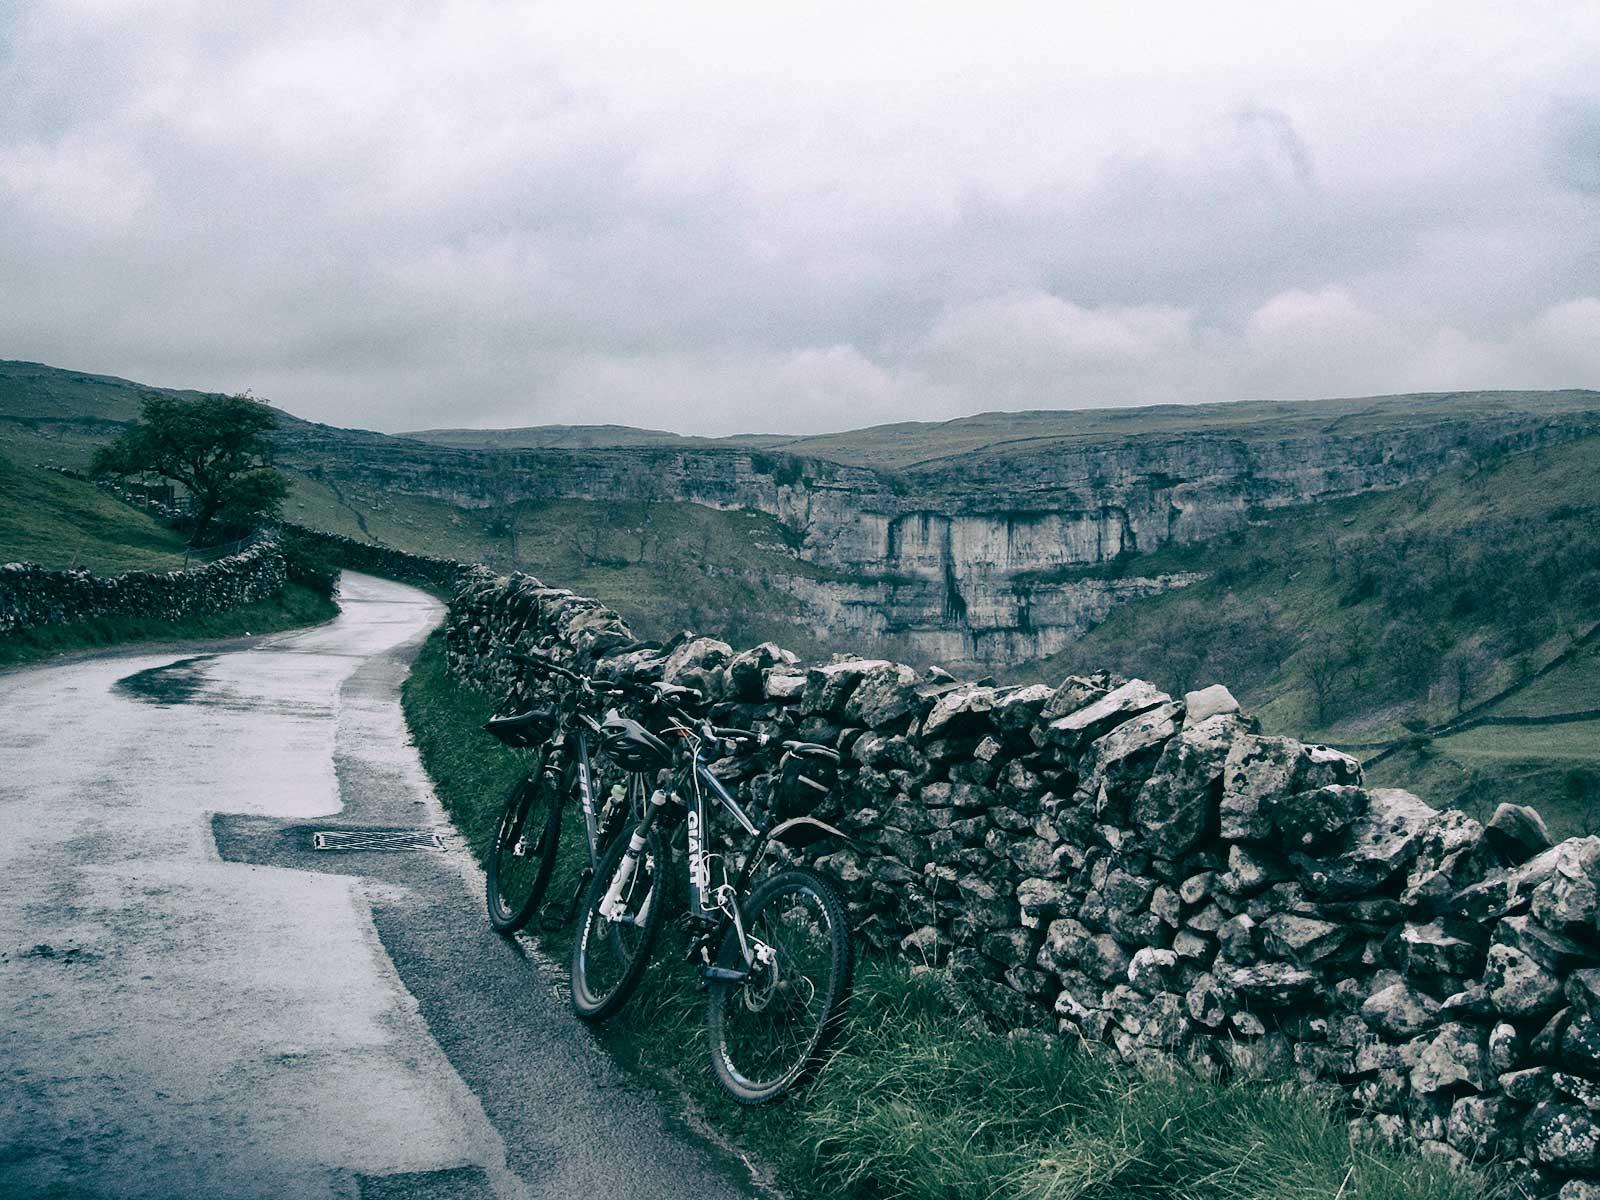 Airton - Malham - Calton Moor Bike Route